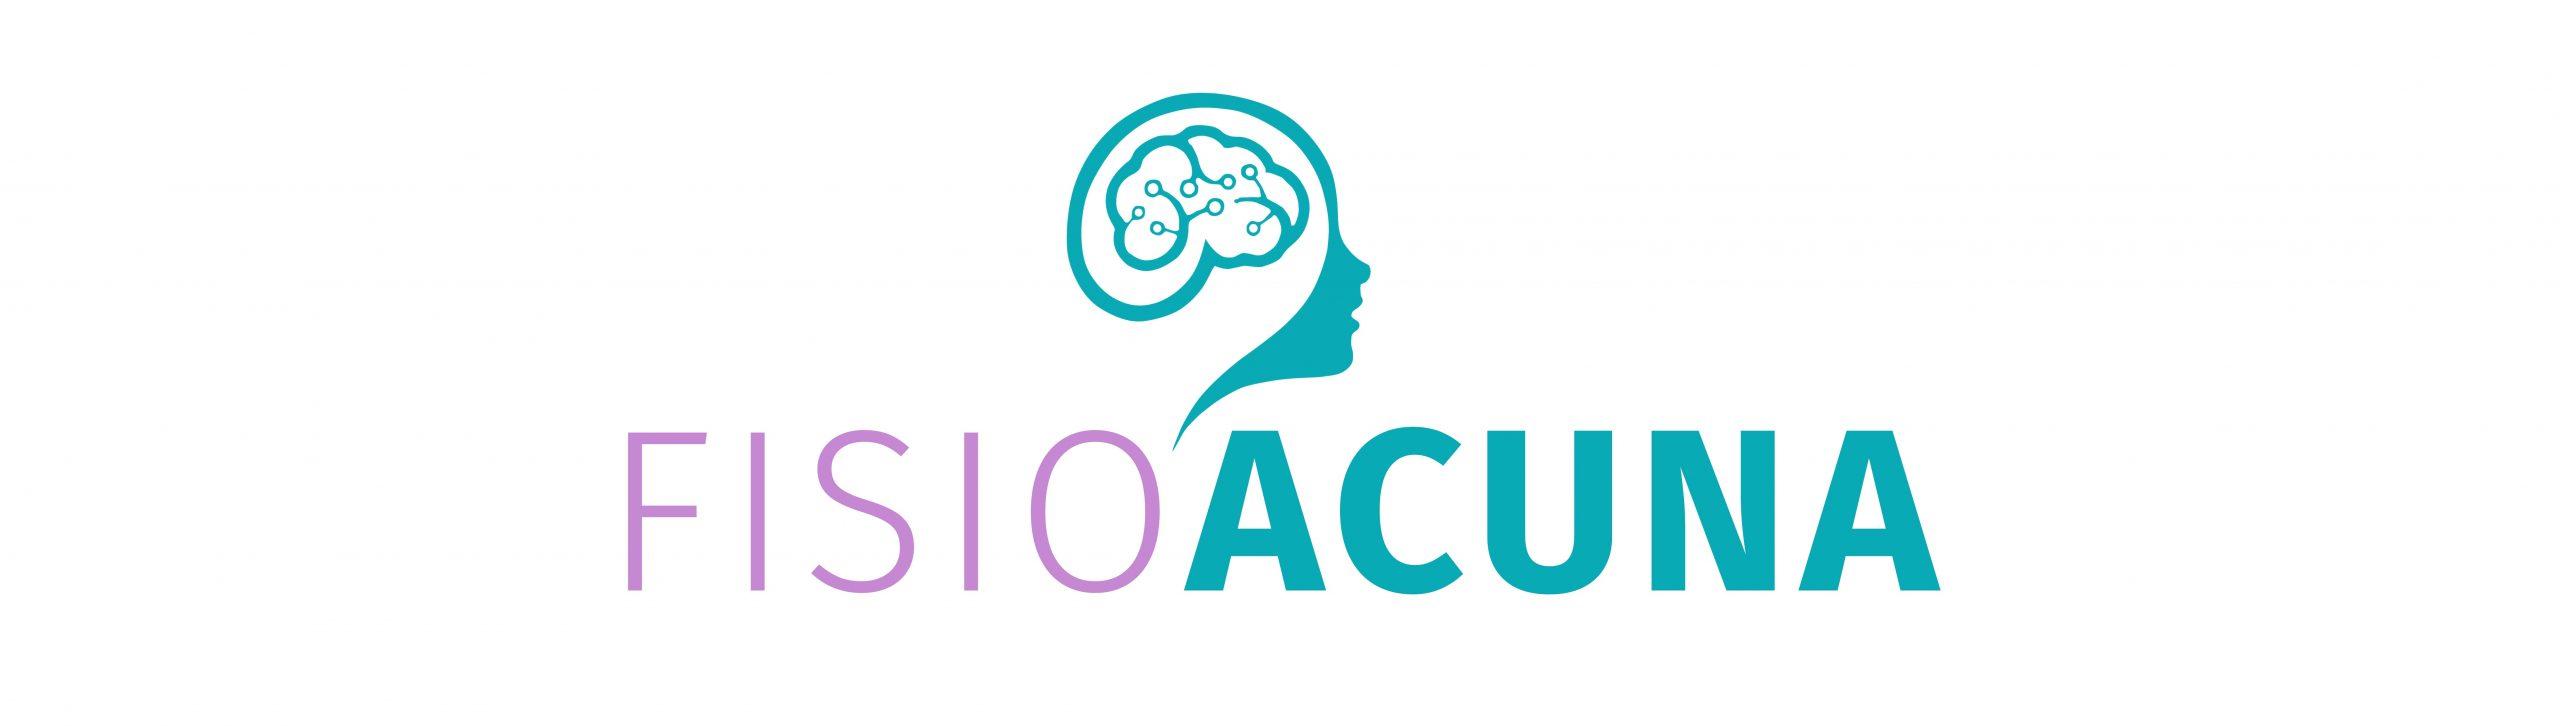 FisioAcuna Logo